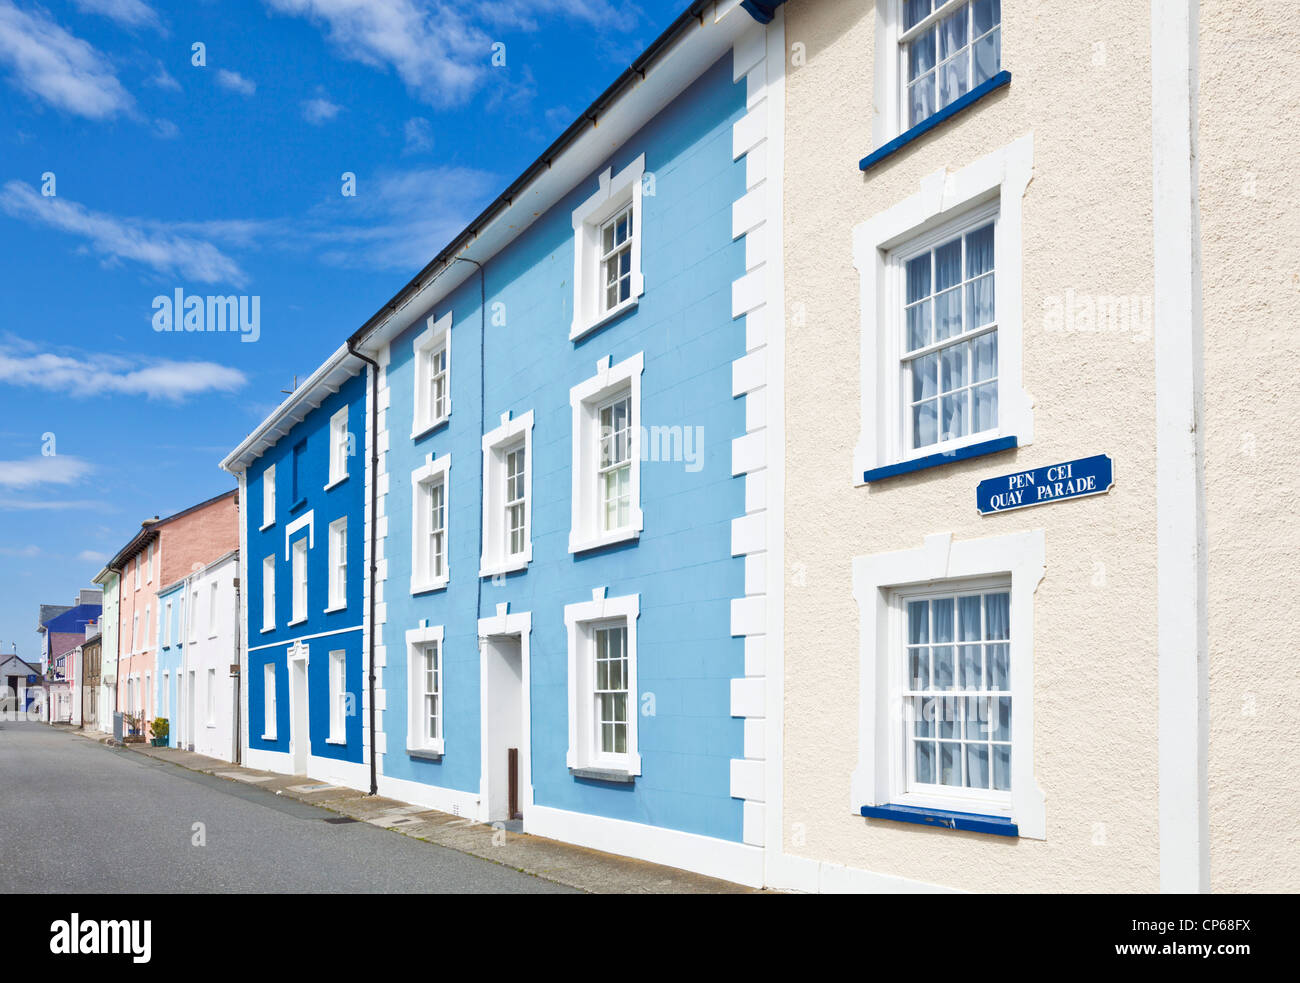 Maisons colorées Aberaeron Ceredigion Mid Wales coast UK GB EU Europe Photo Stock